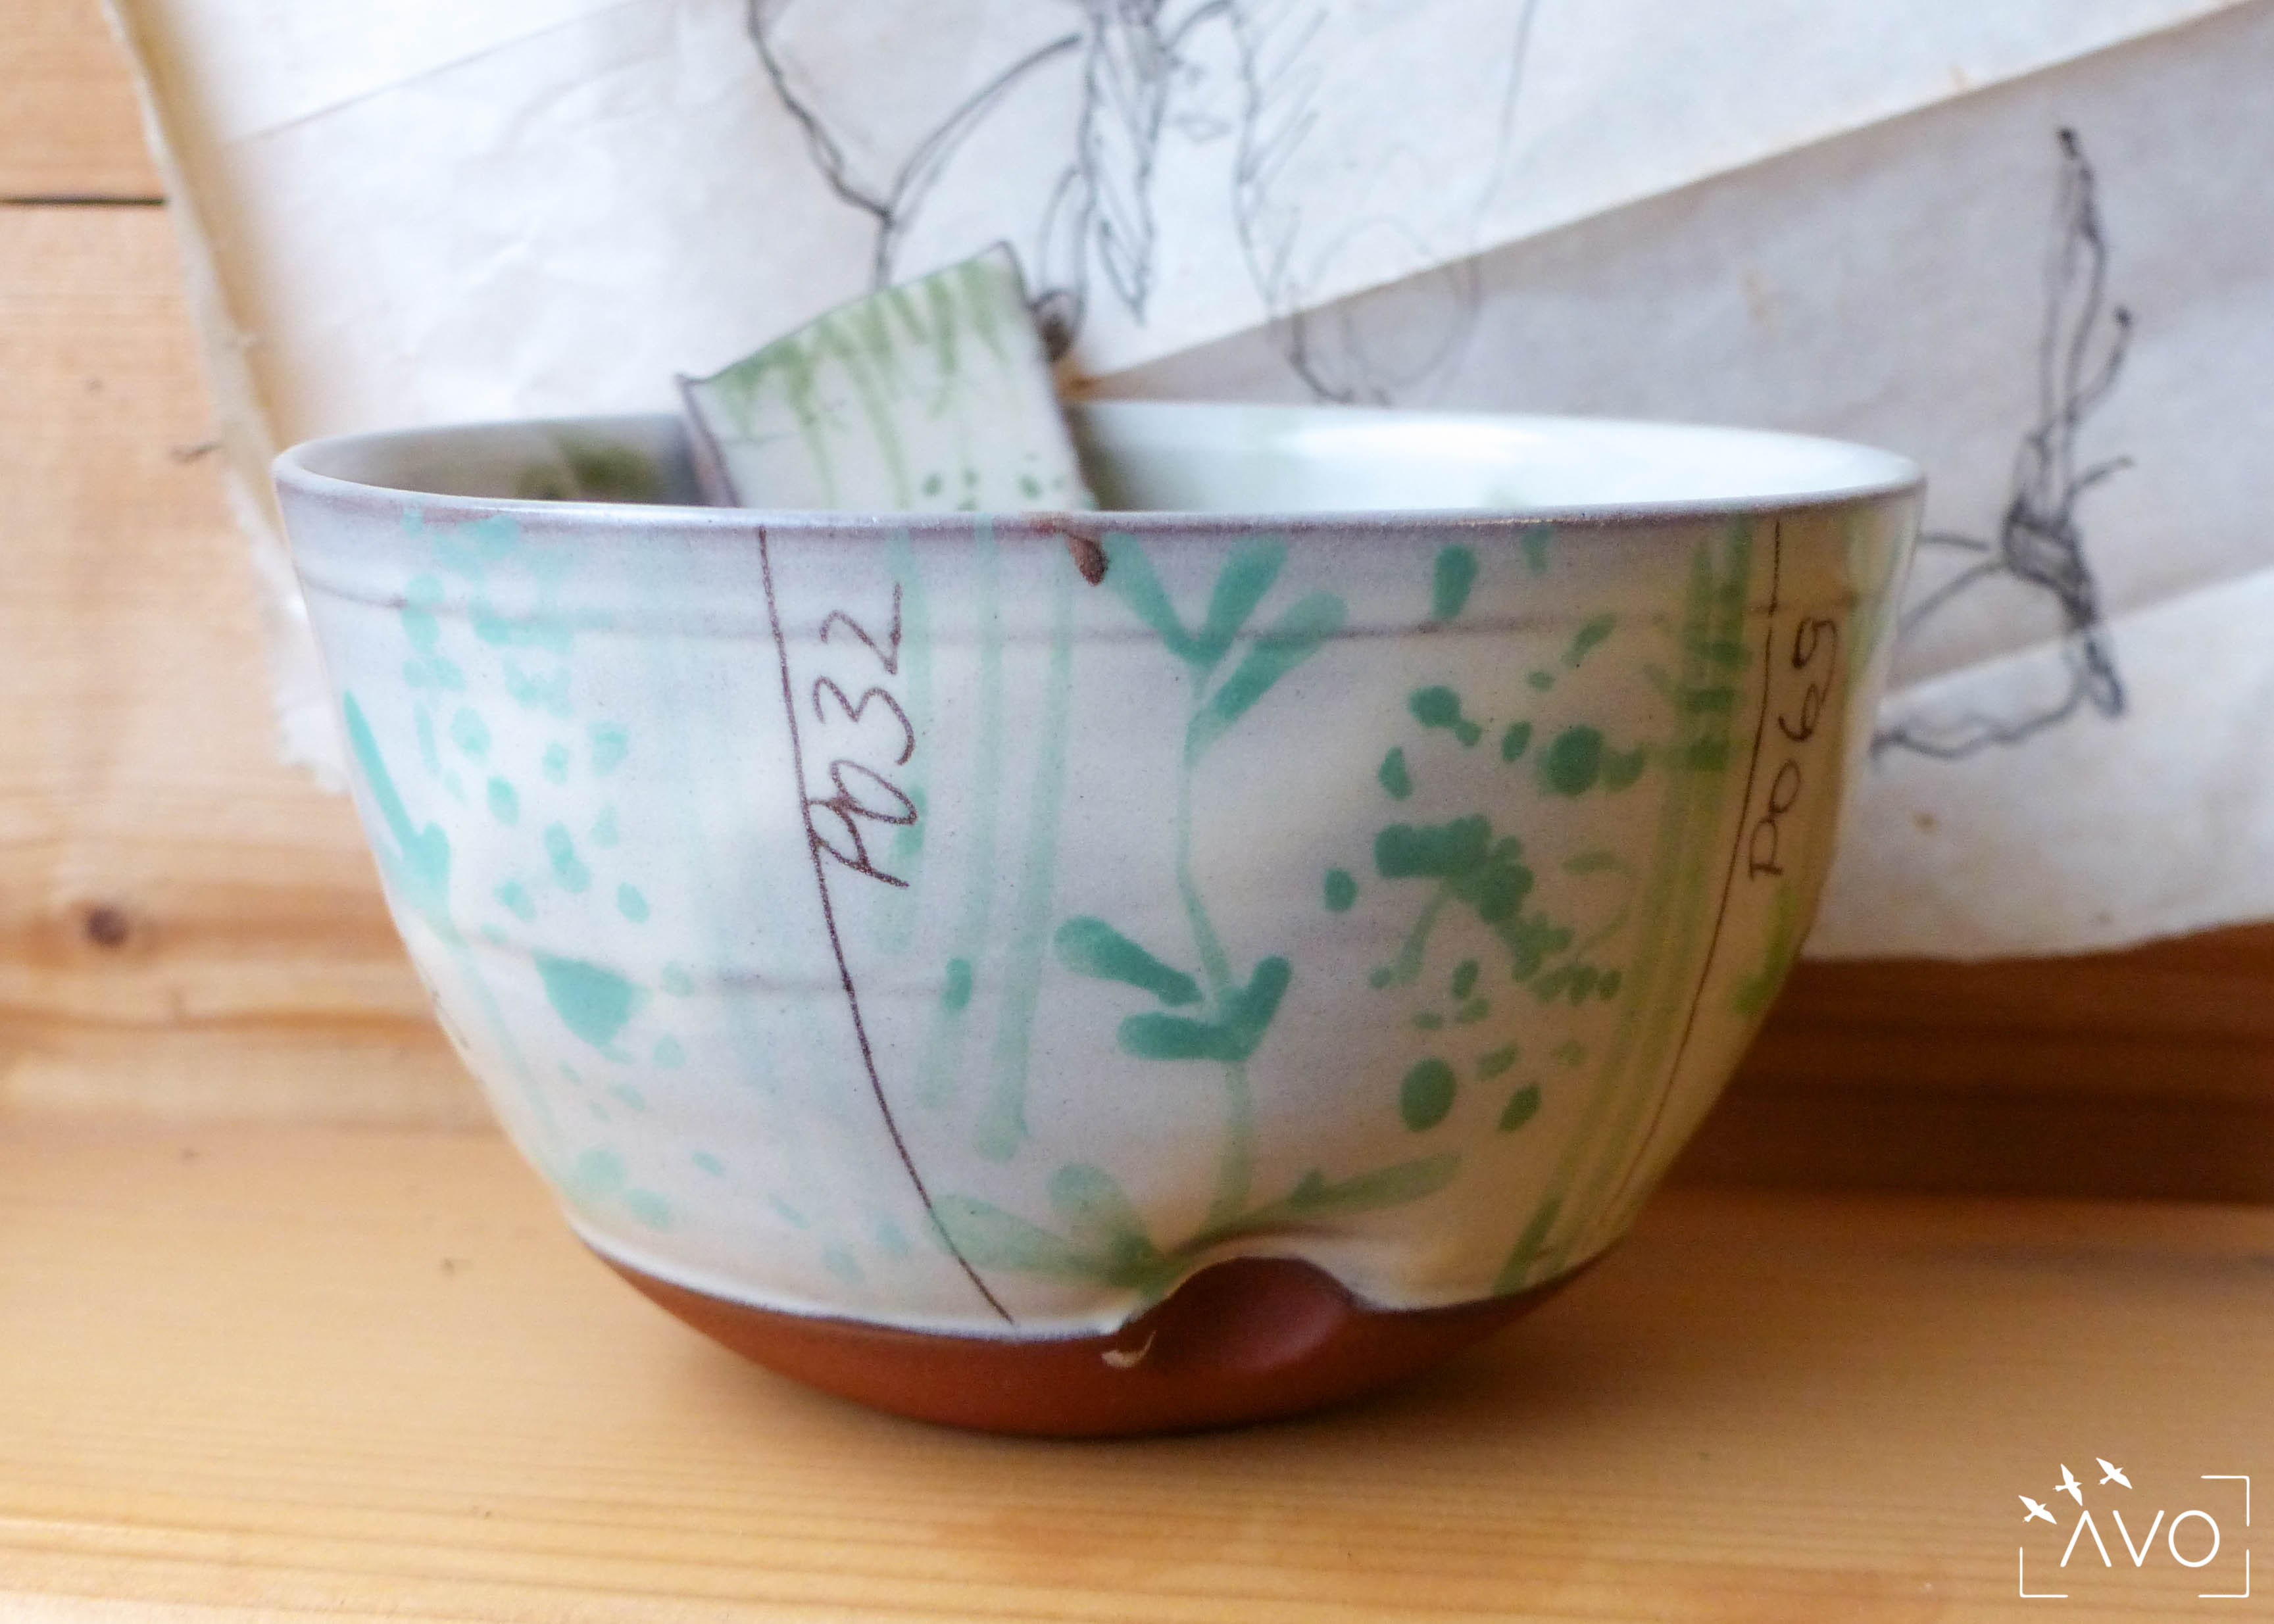 marina-leflon-ceramiste-courzieu-atelier-gres-faience-fleurs-terre-avo-avoldooiseau-ceramiques